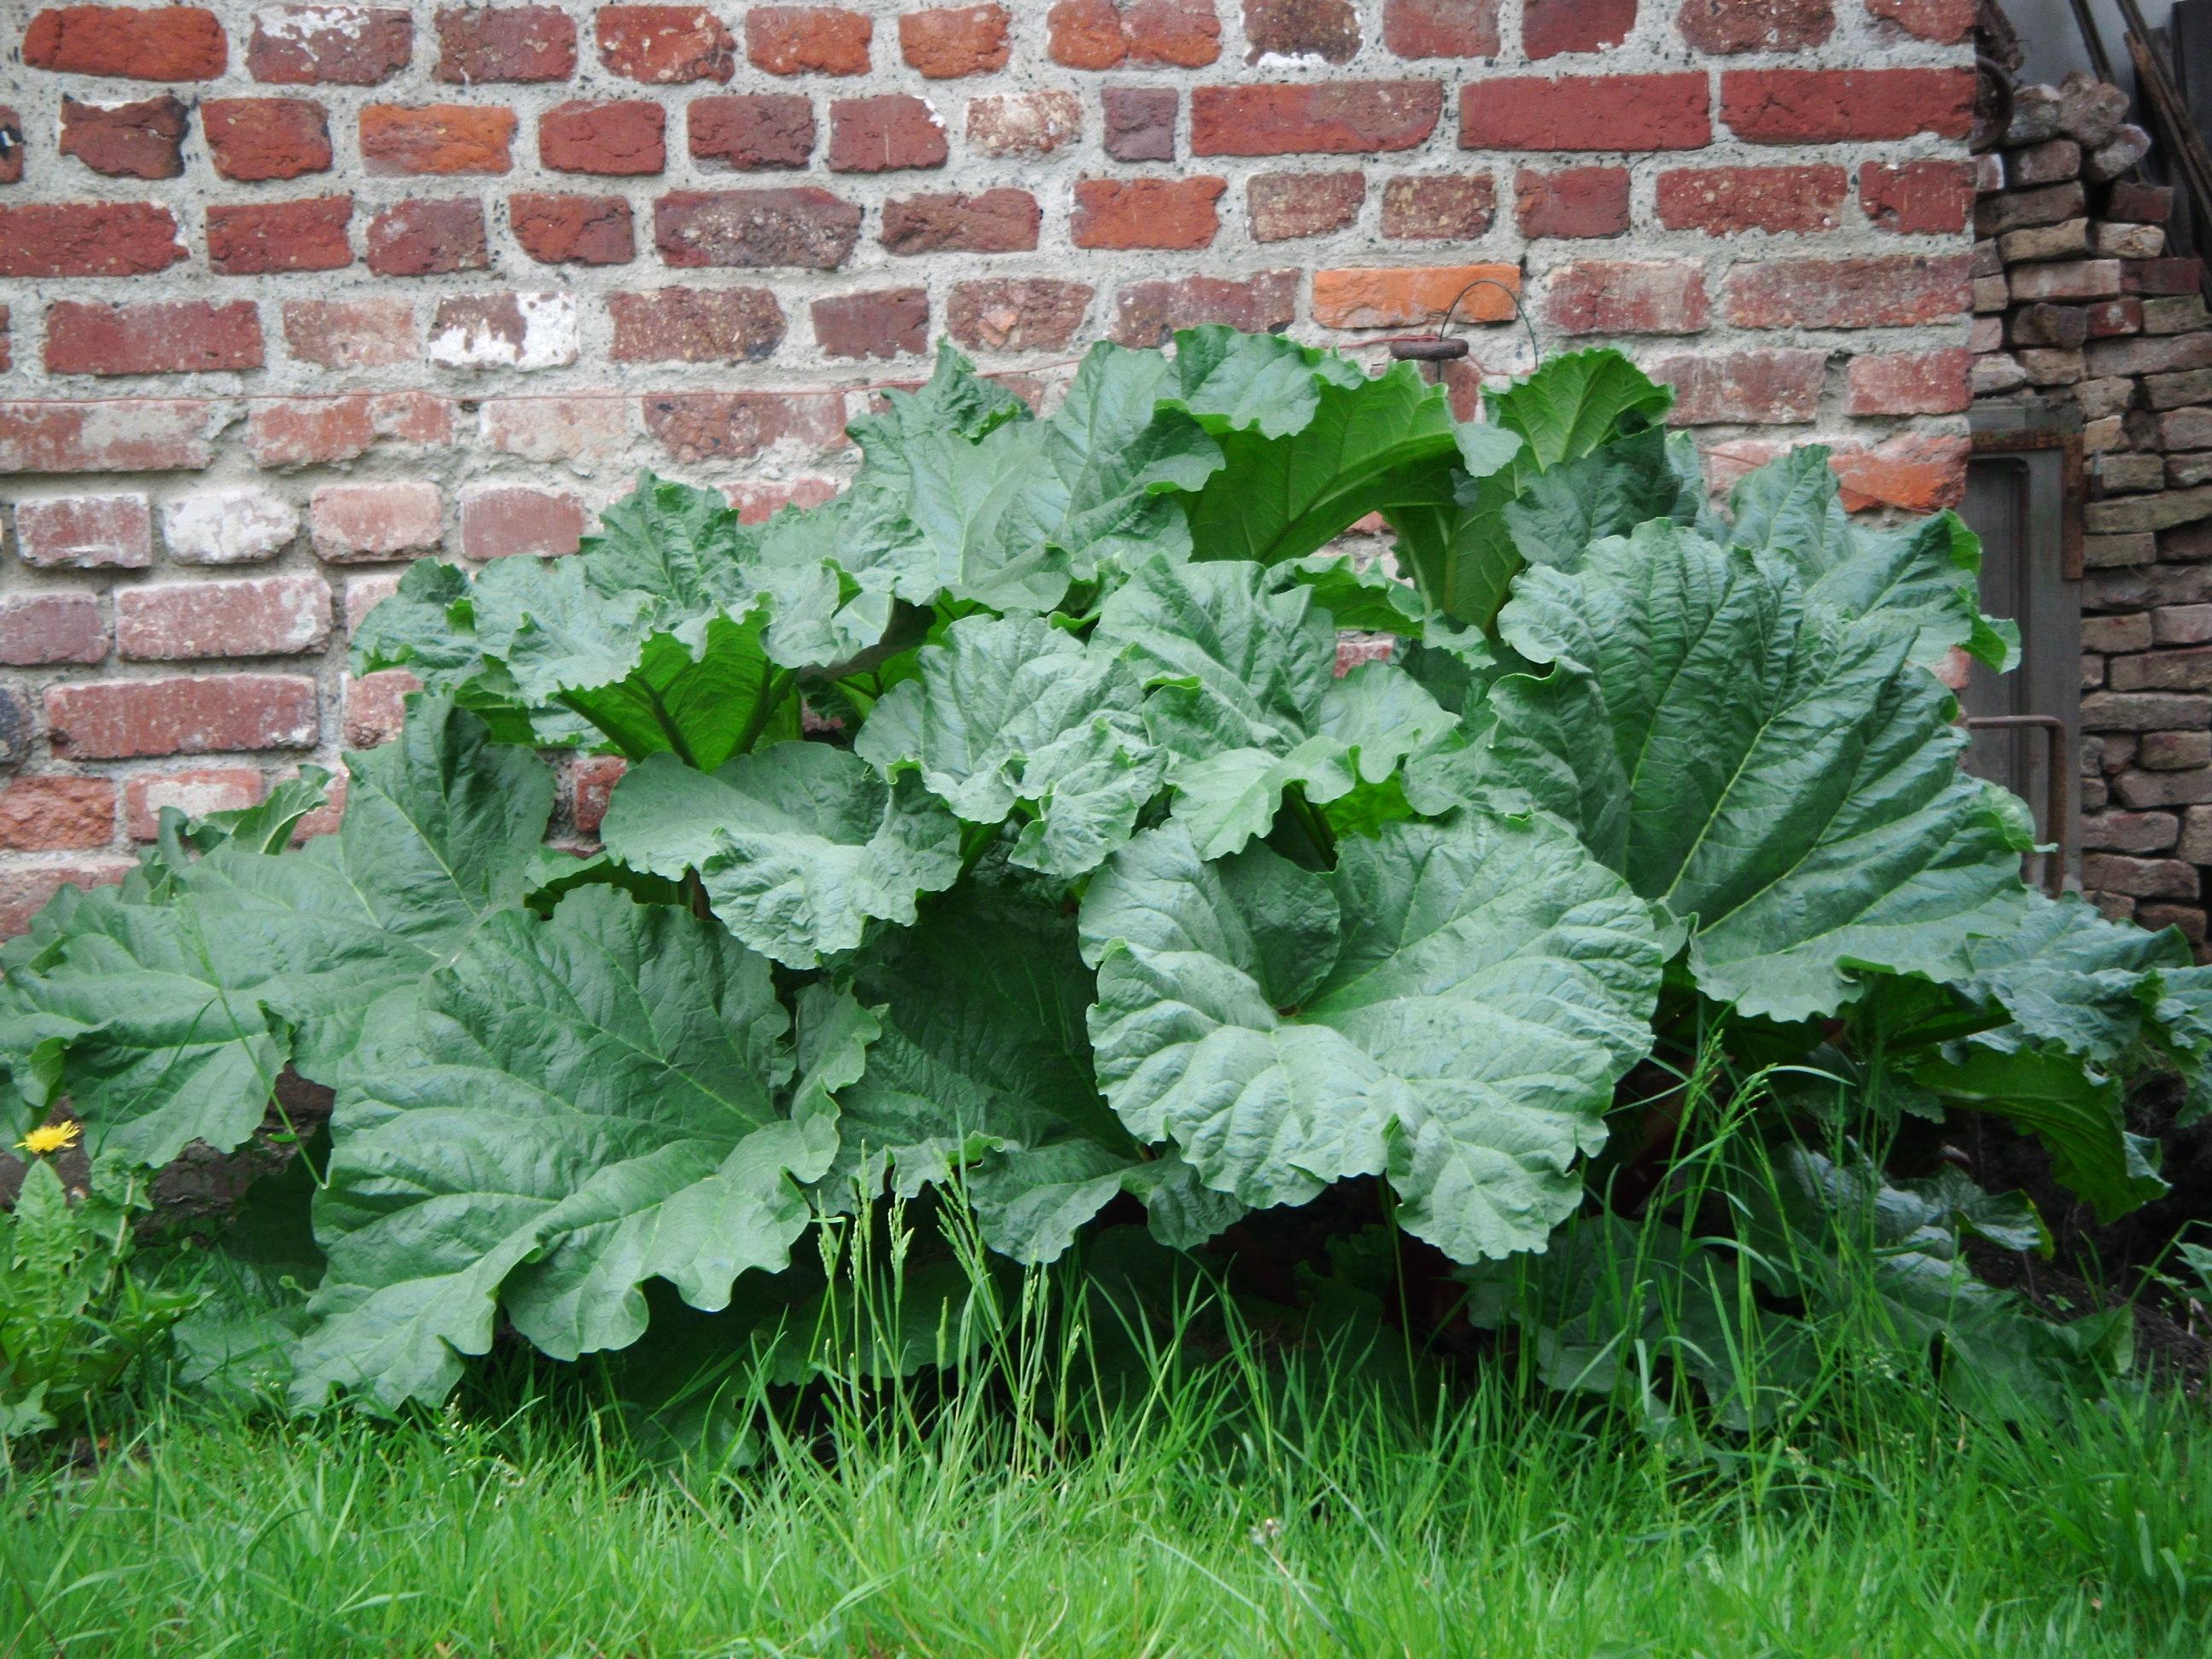 100 Incroyable Suggestions Où Planter La Rhubarbe Dans Le Jardin